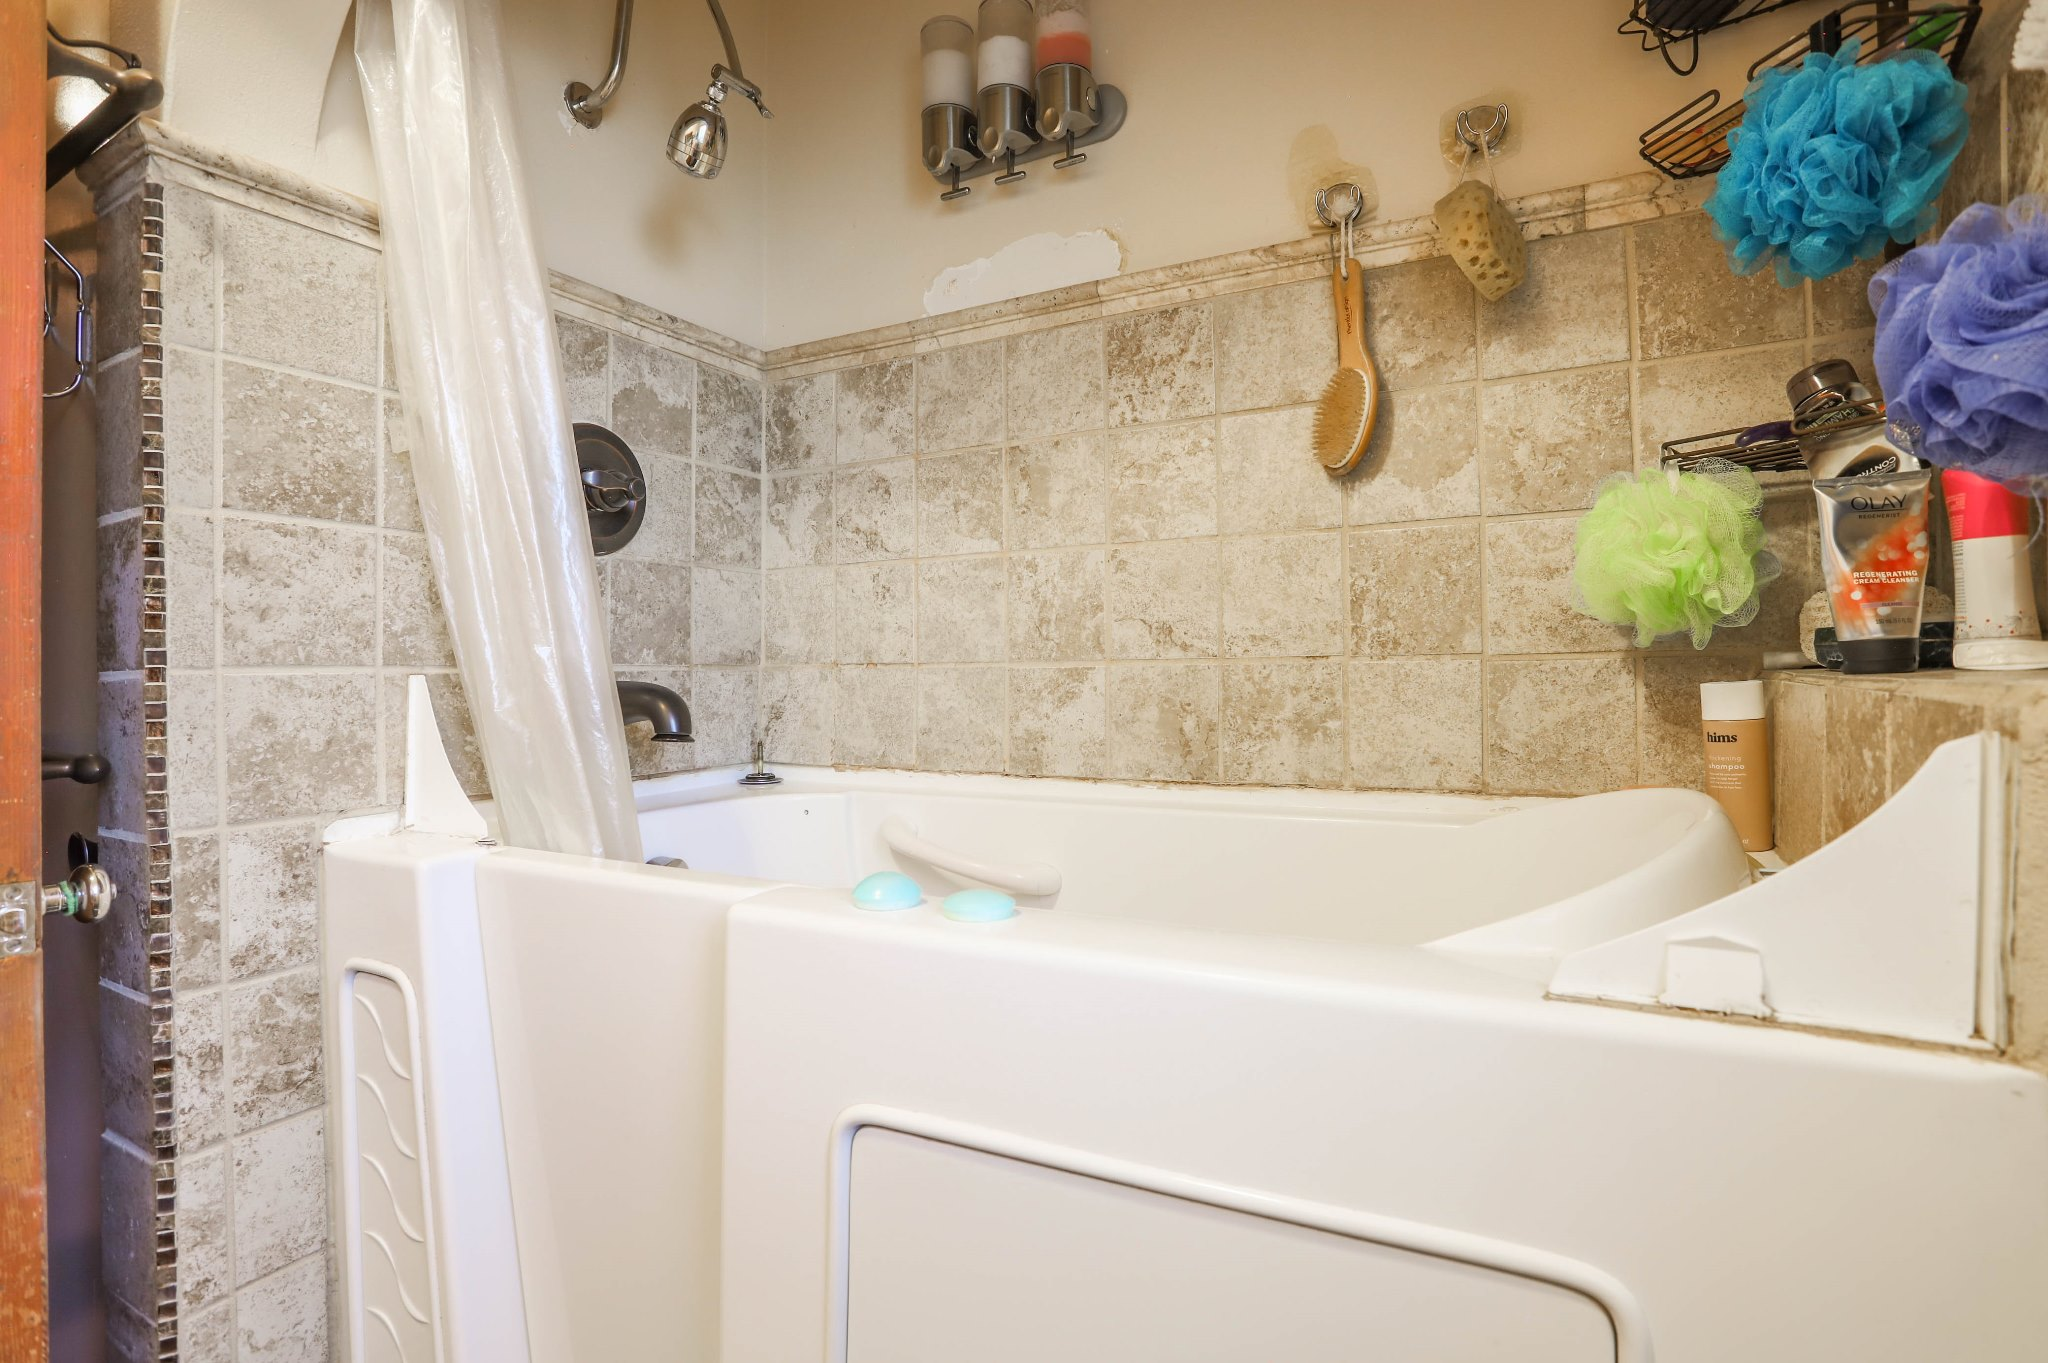 REAL ESTATE LISTING: 75 Zephyr St Lakewood Shared Full Bath